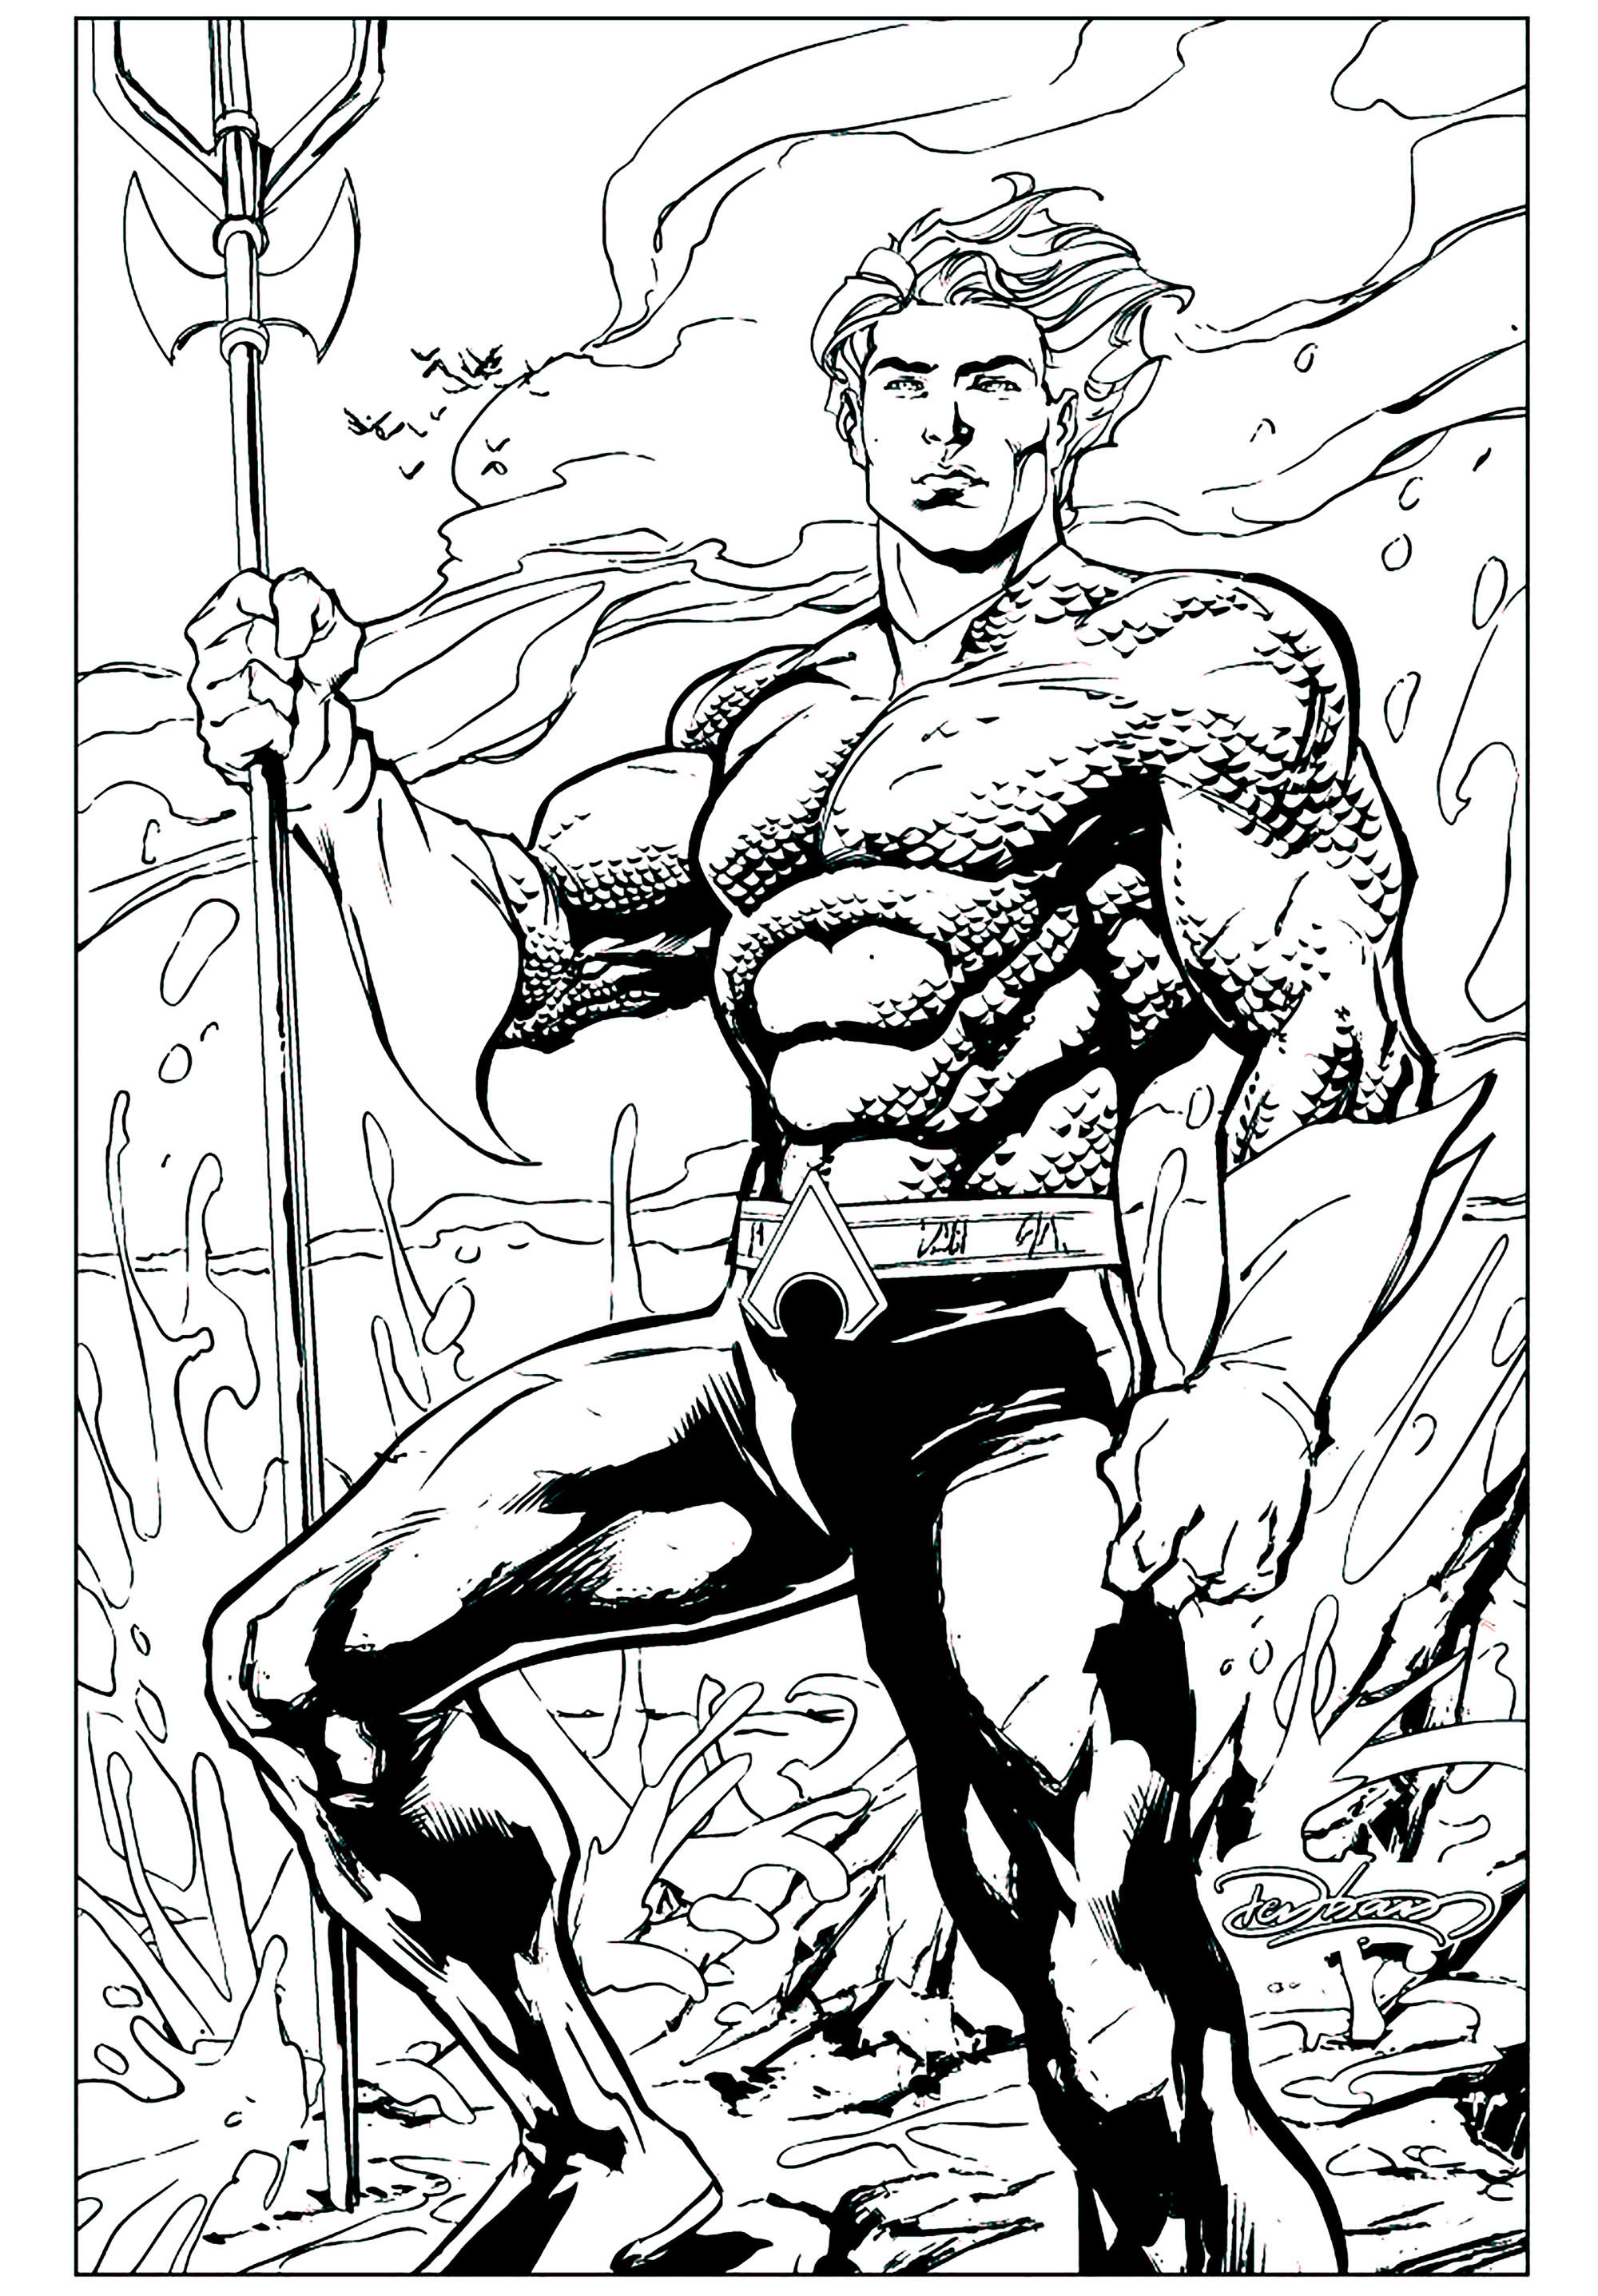 Image De Aquaman A Imprimer Et Colorier Coloriage Aquaman